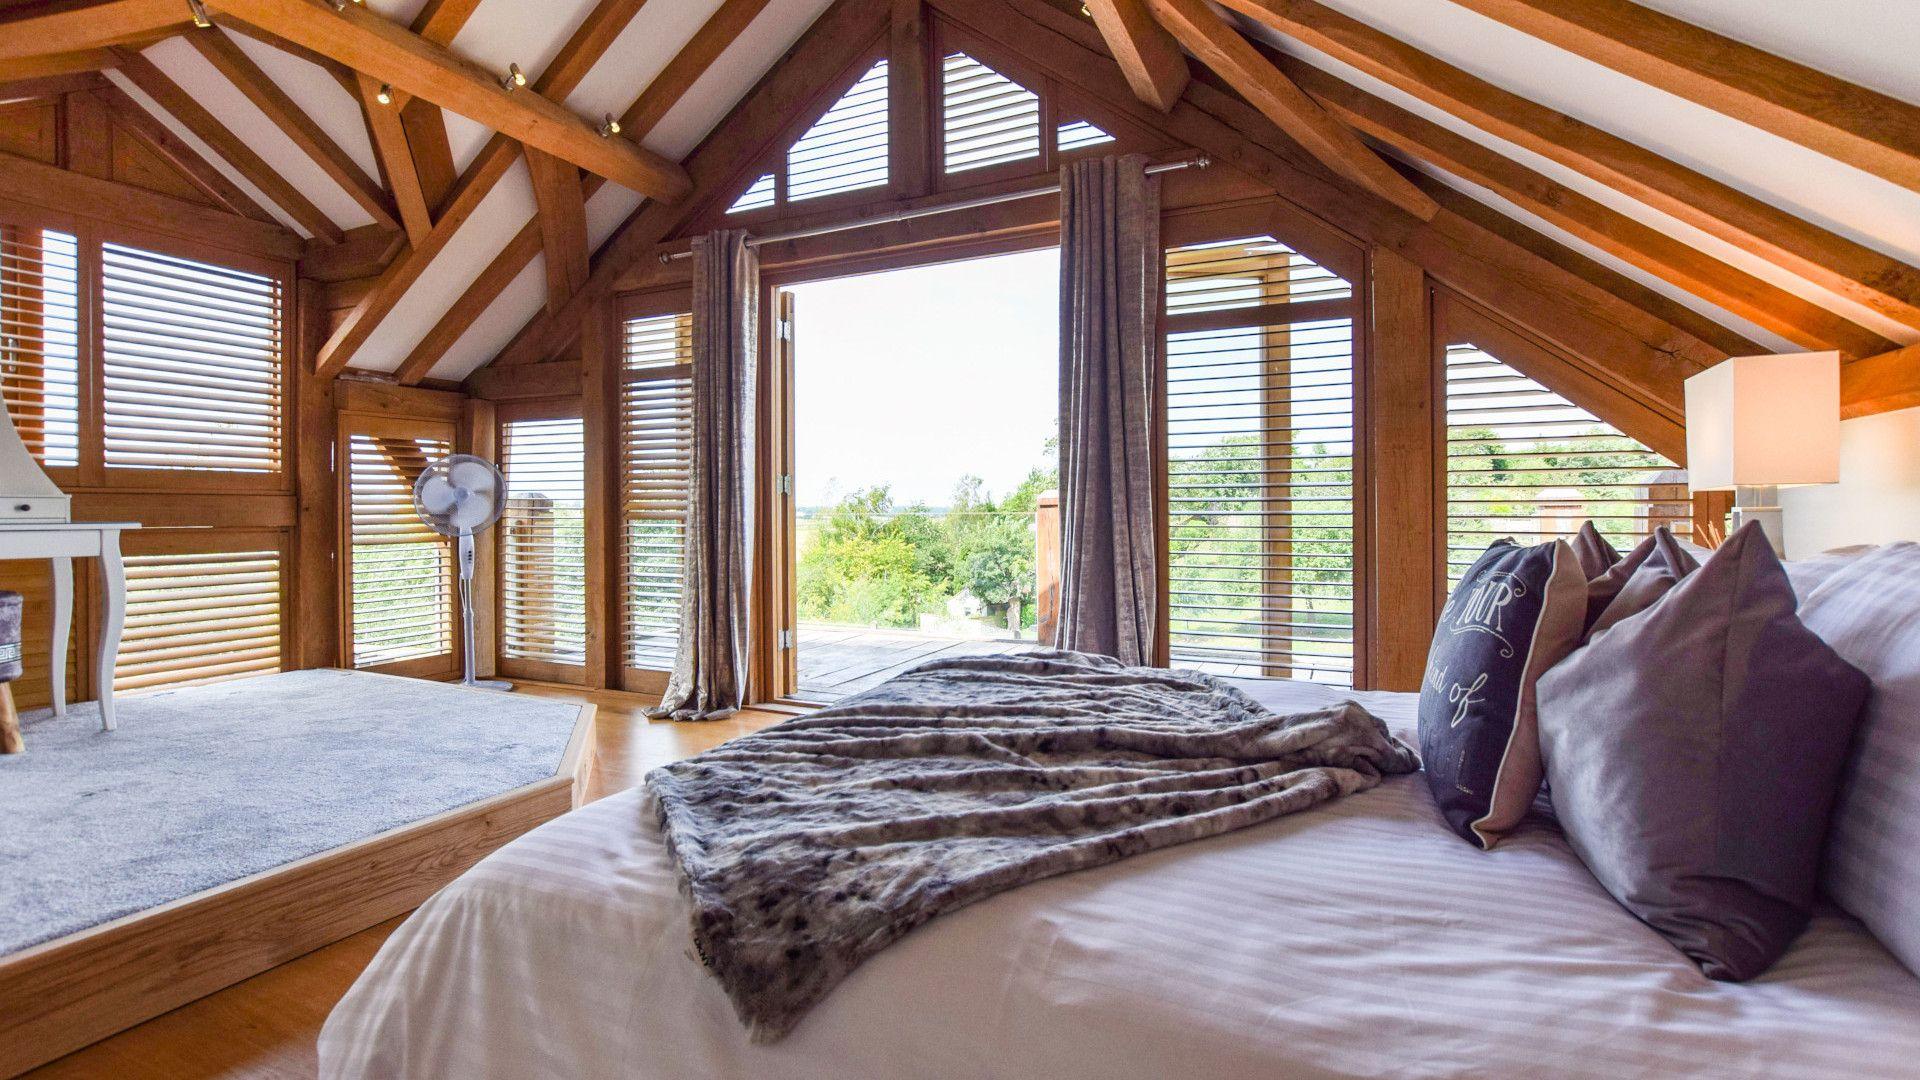 Bedroom 1 with balcony, Old Oak House, Bolthole Retreats